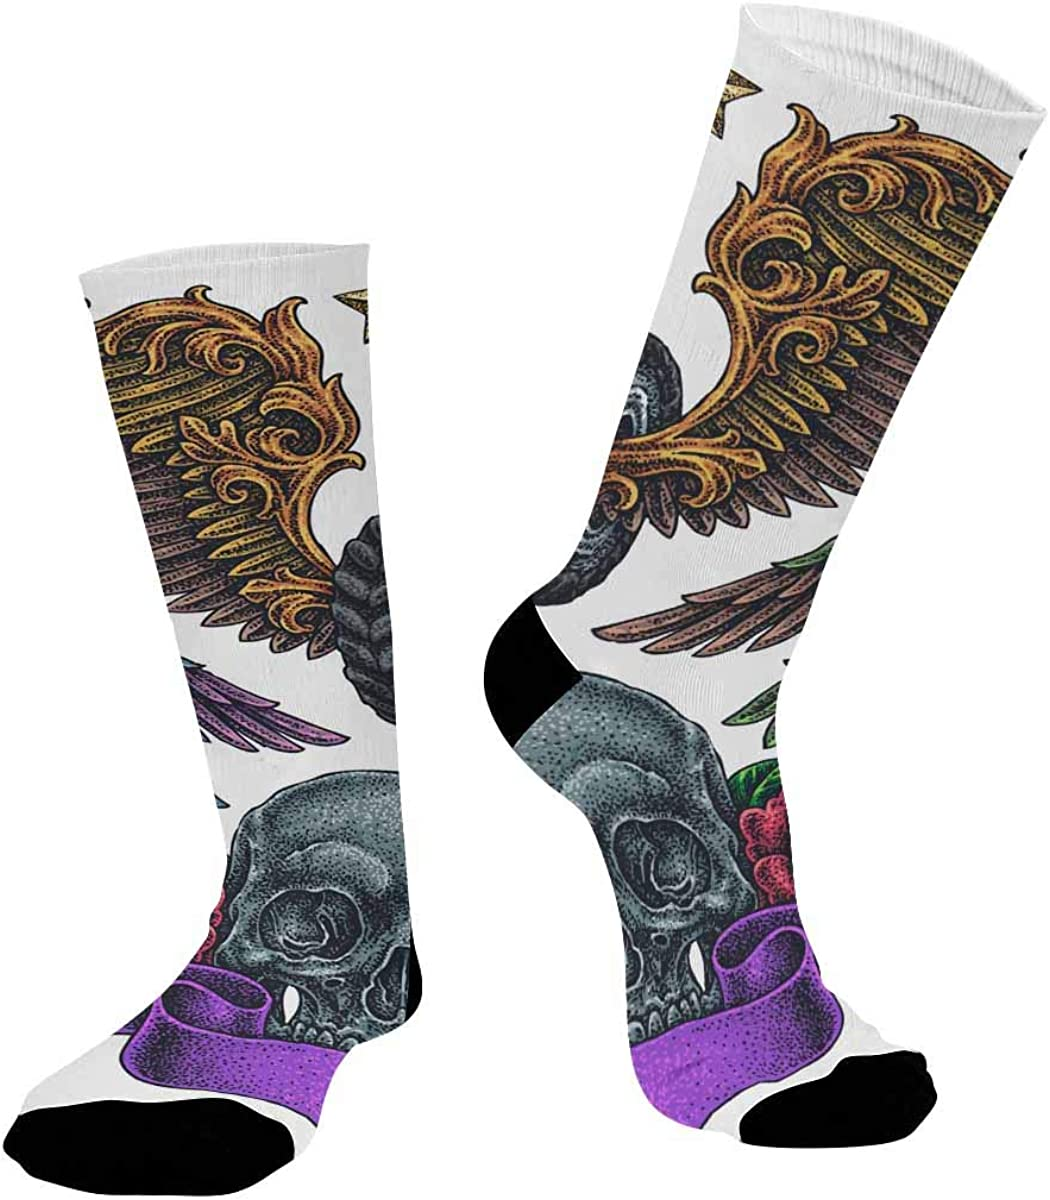 INTERESTPRINT Sublimated Hiking Dress Athletic Crew Socks Old School Flying Theme Tattoos